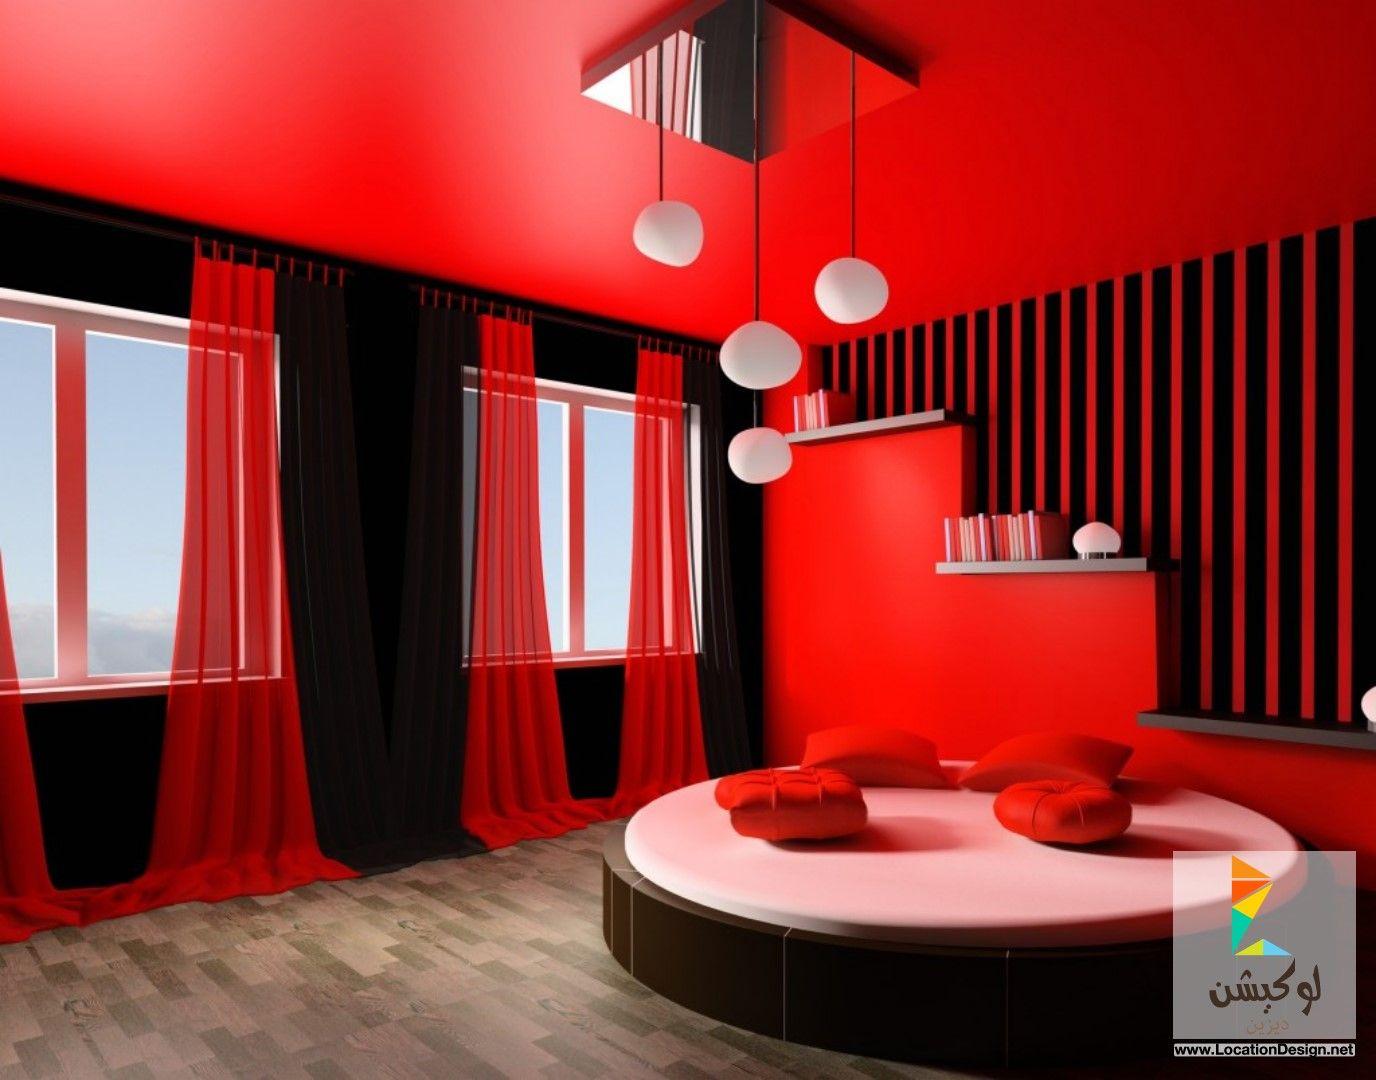 غرف نوم أحمر وأسود | ديكورات غرف نوم | Pinterest